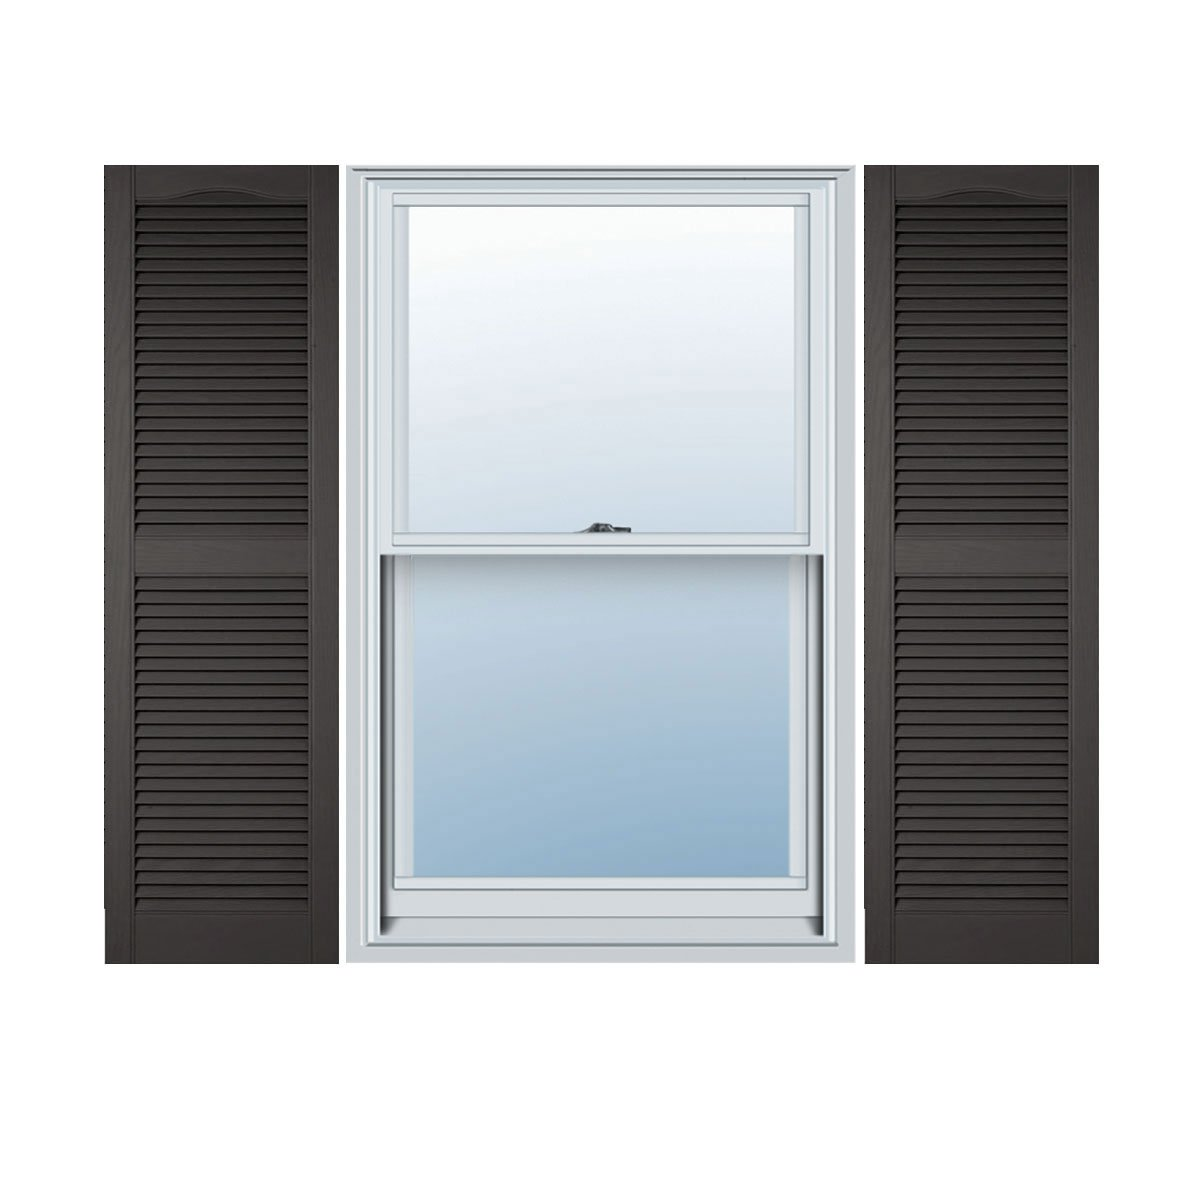 018 14.5W x 52H Builders Edge  Shutters Tuxedo Grey Per Pair